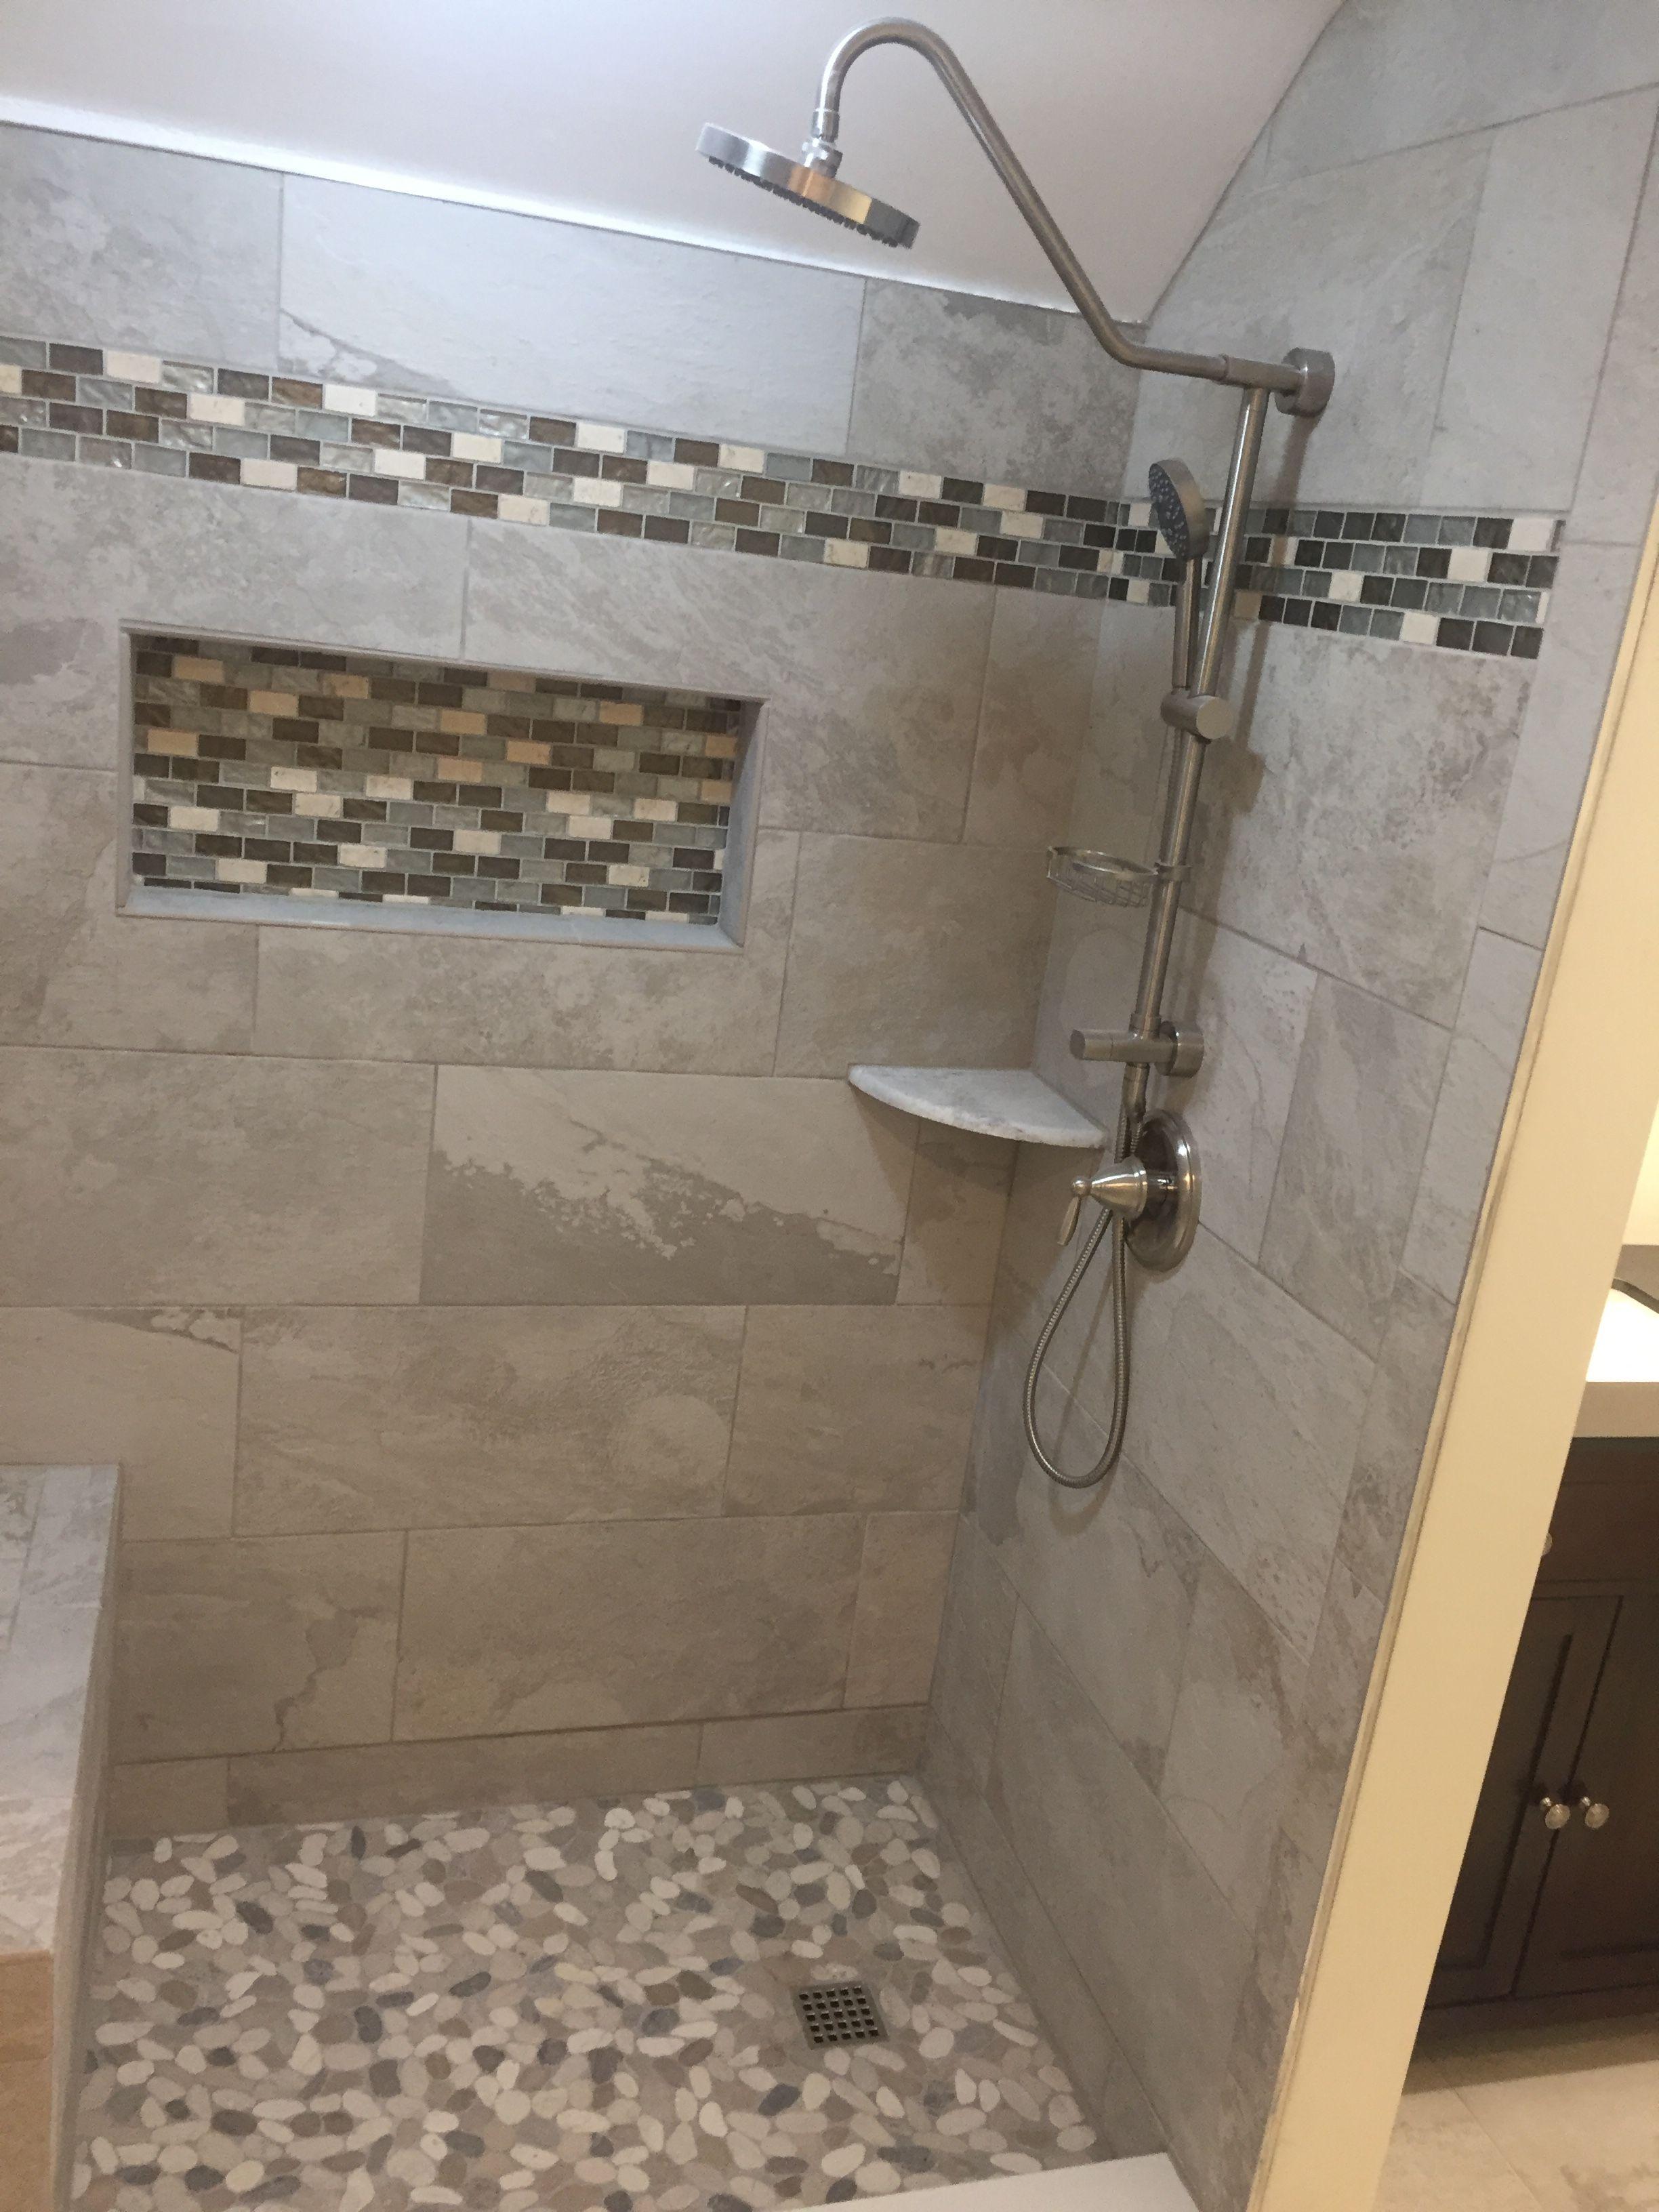 Ivetta White Tiles And Mosaic Border Using The Durock Shower